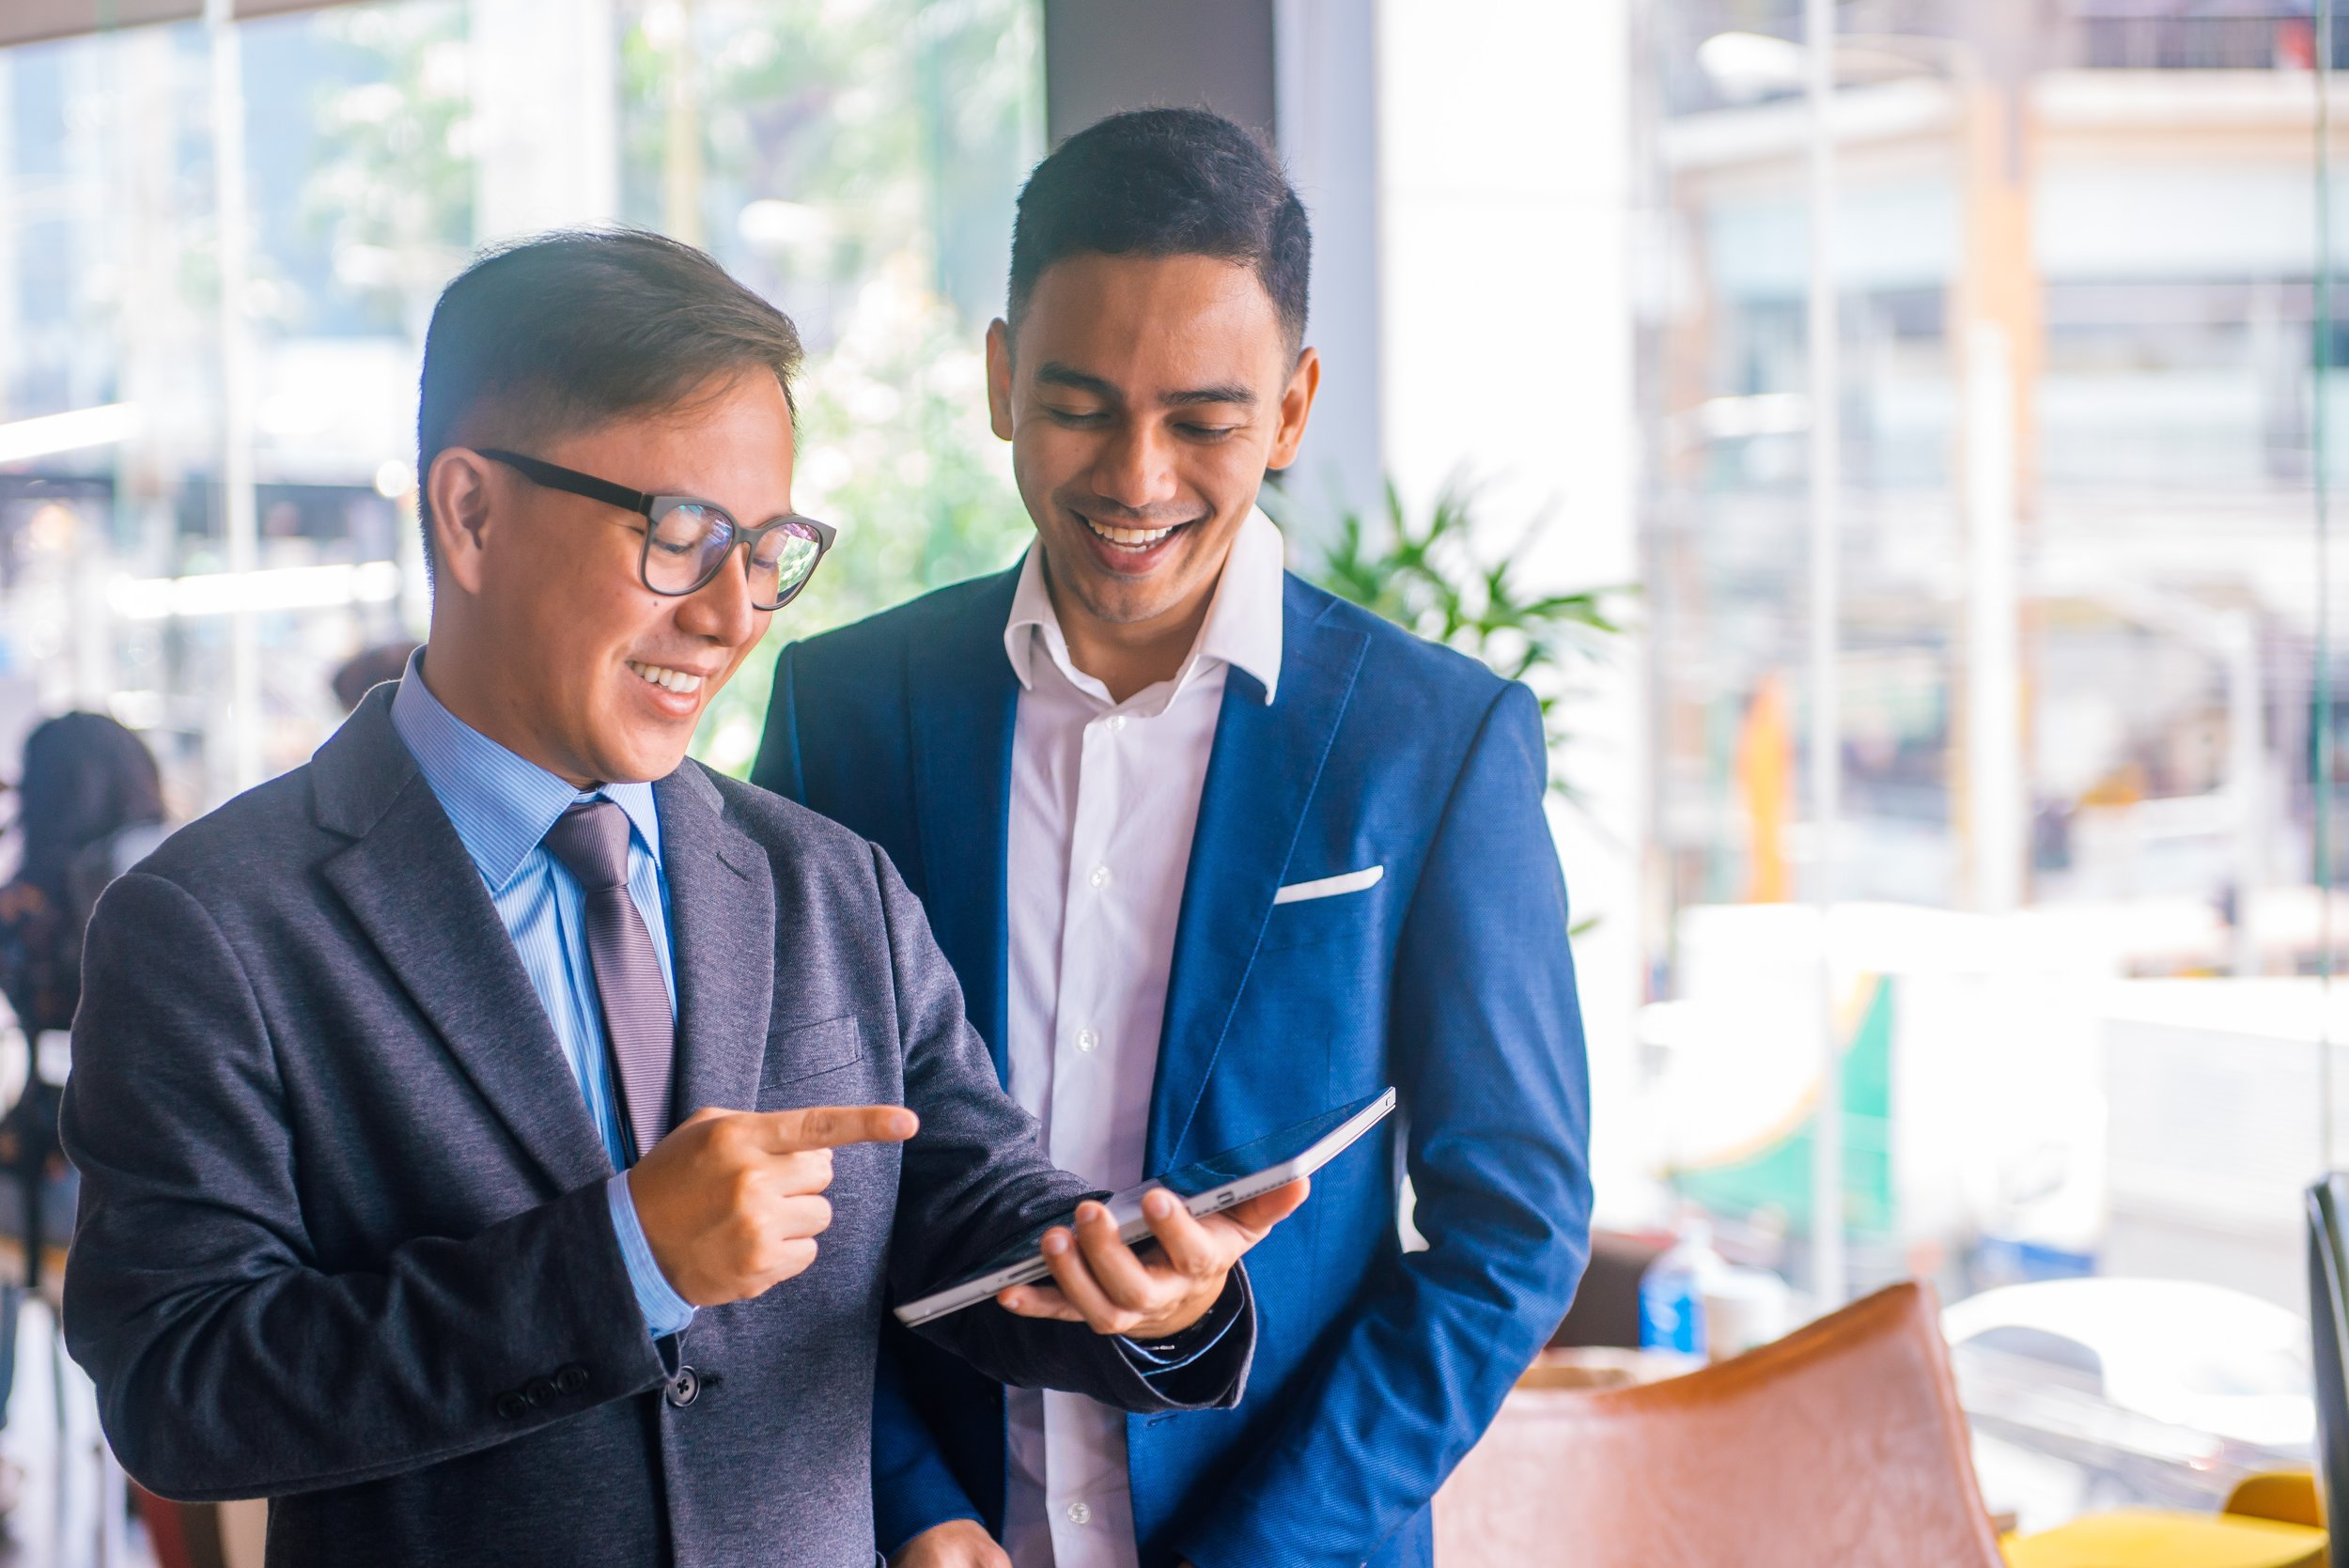 men-meeting-to-discuss-on-tablet.jpg